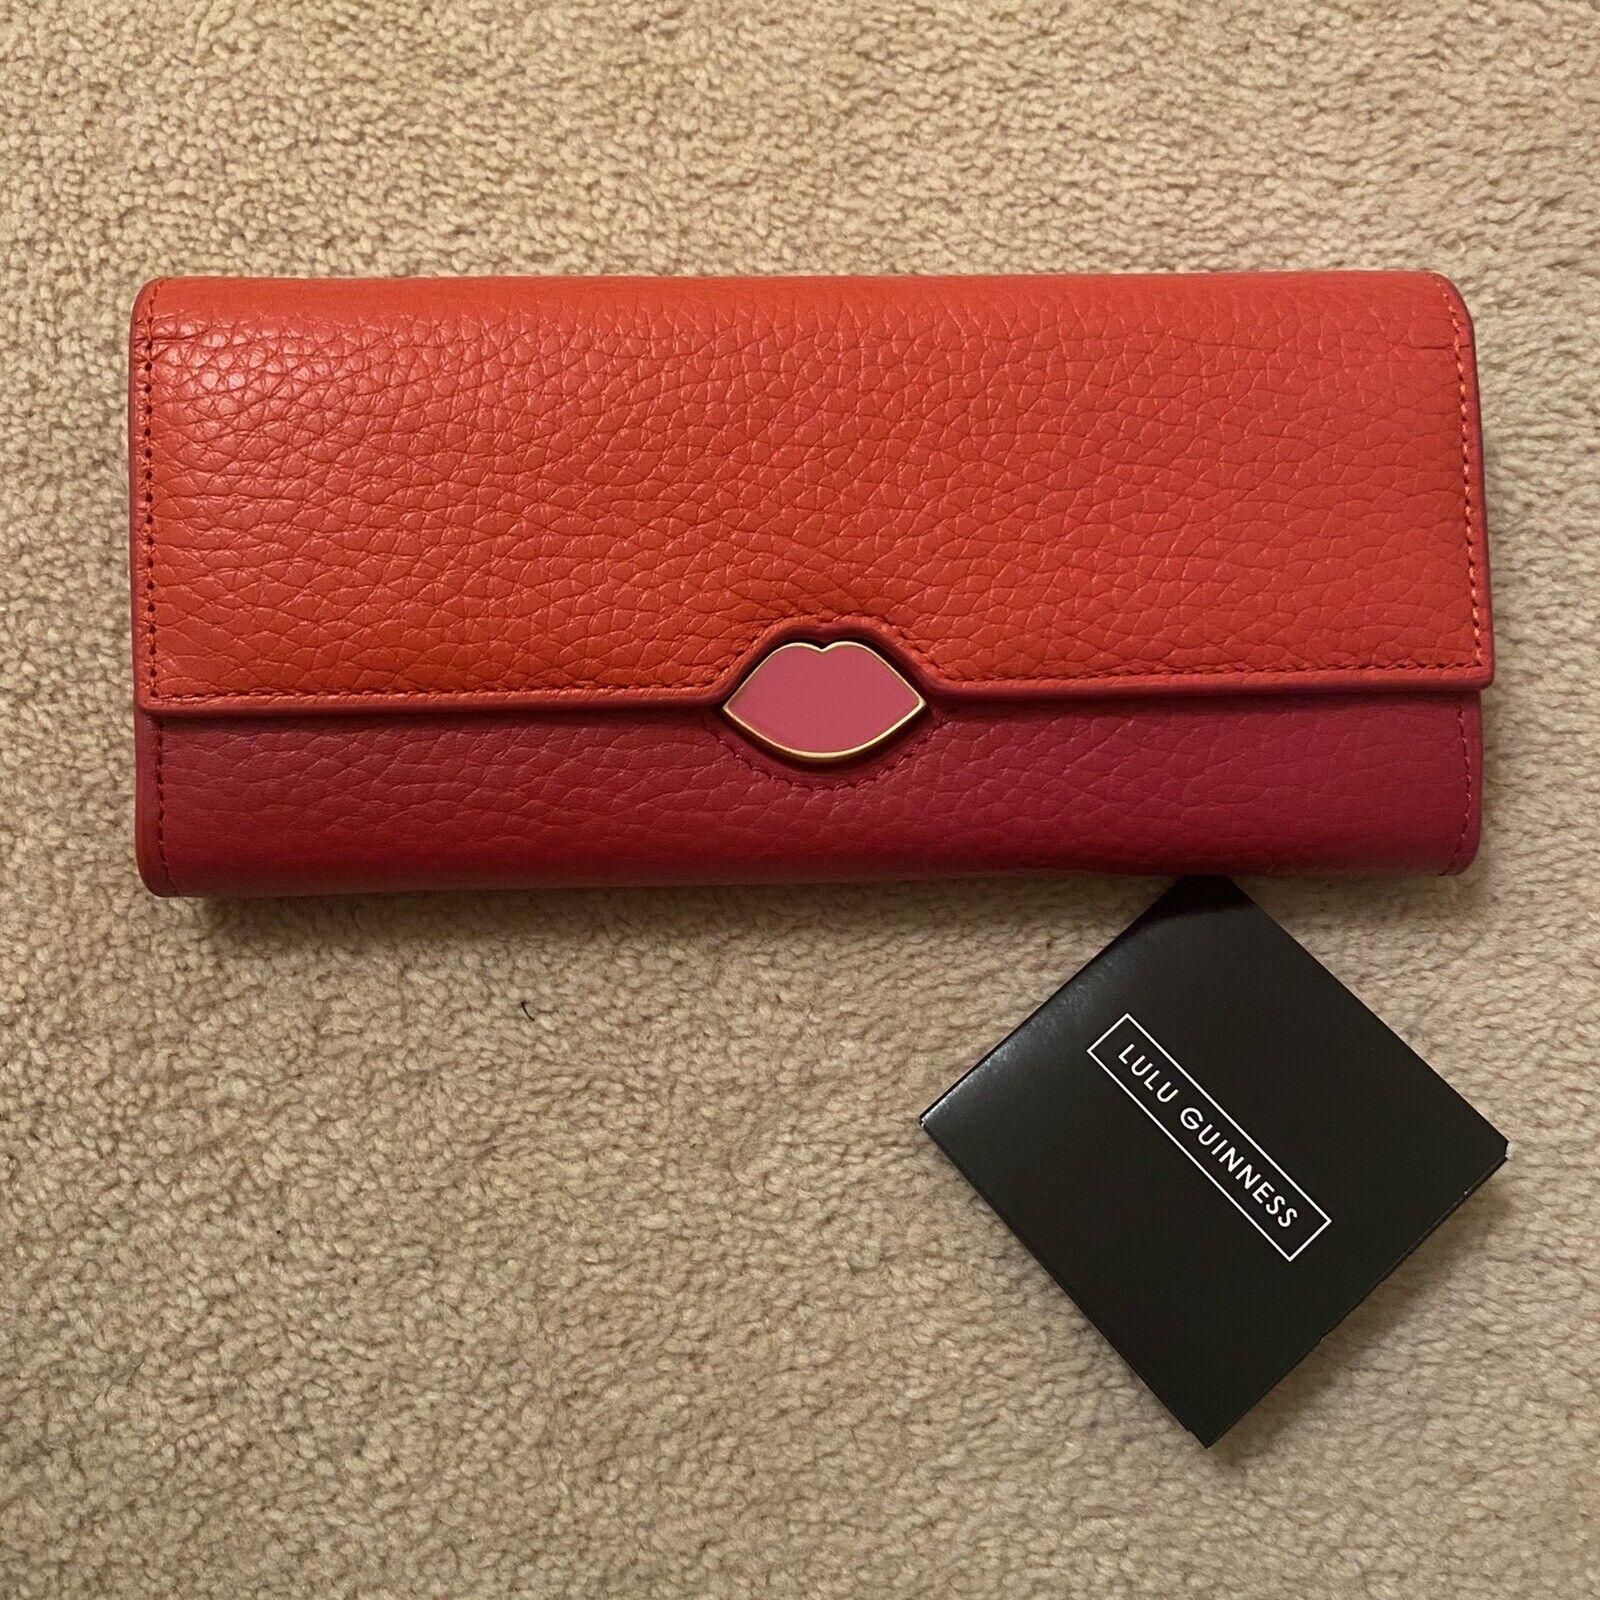 Lulu Guinness Lipstick Lock Cora Wallet Purse BNIB Orange & Red Pink Lip Detail